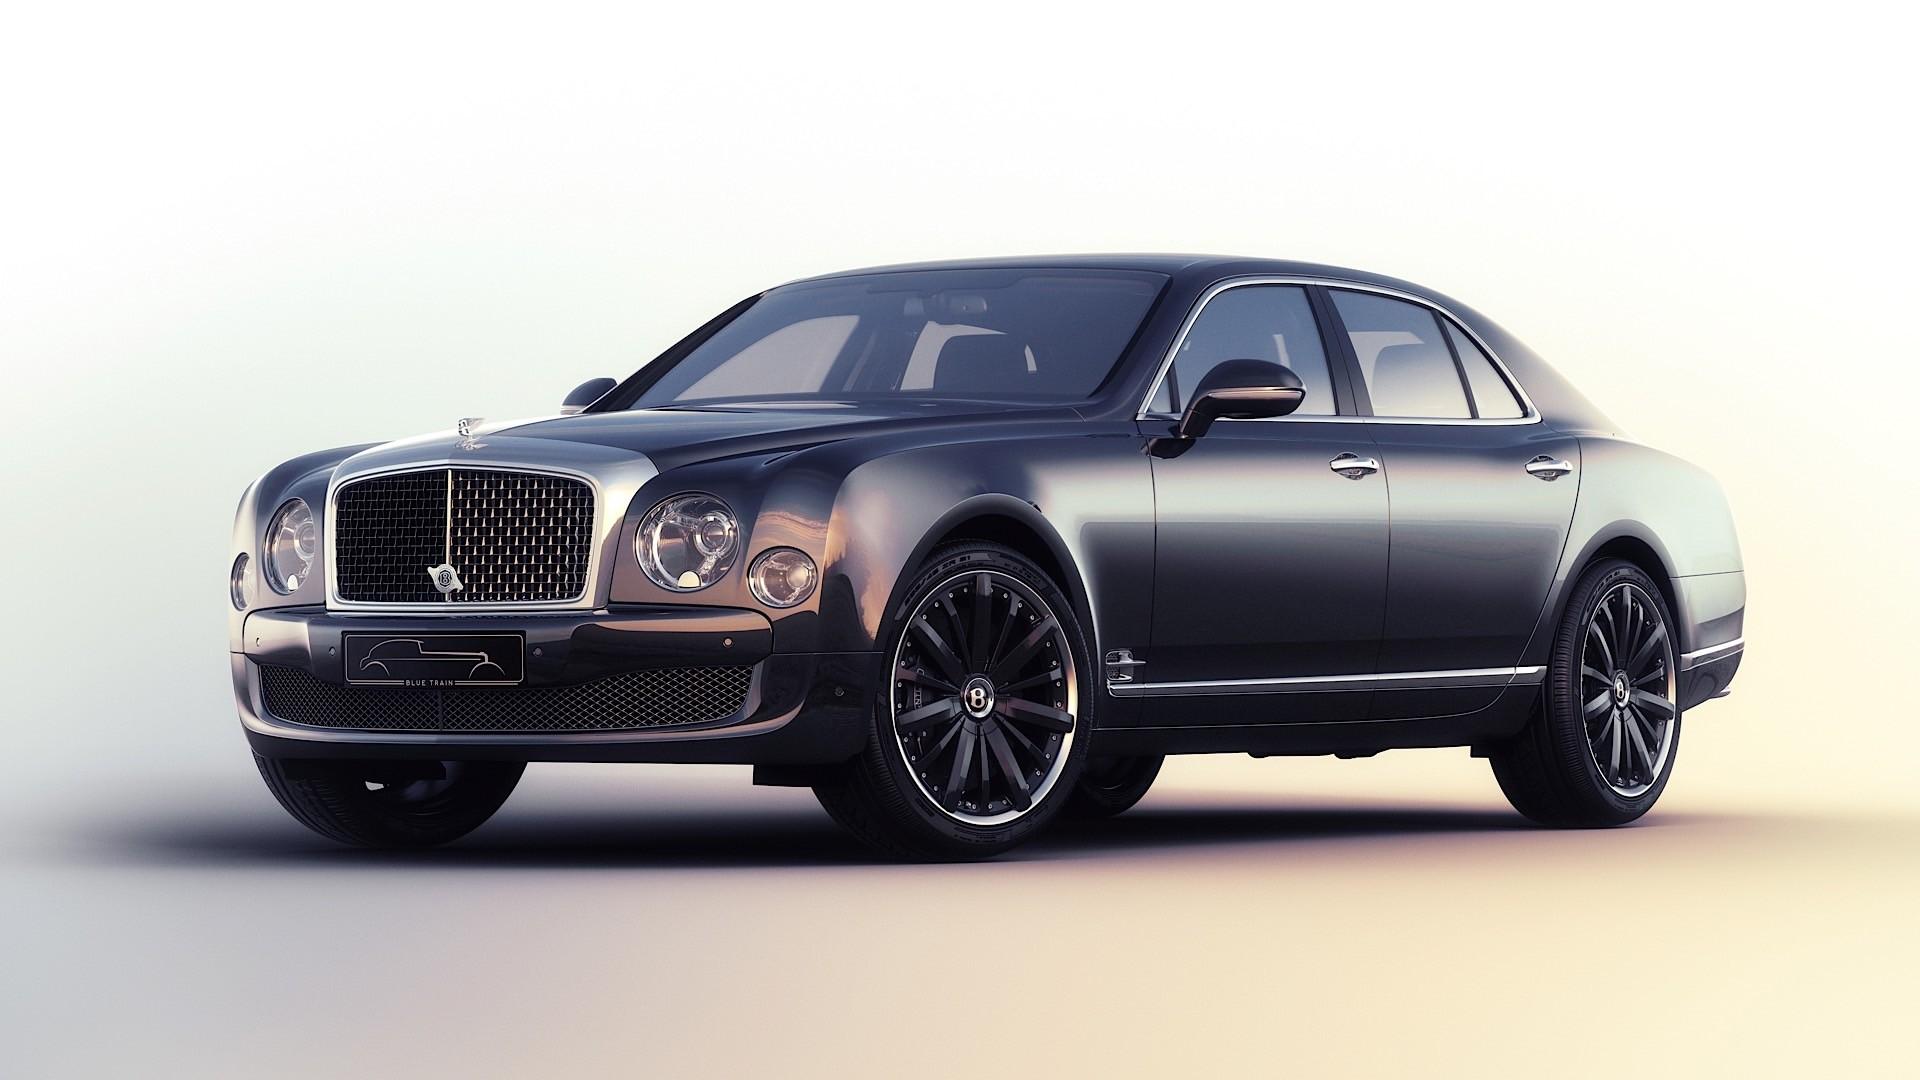 Bentley Mulsanne Speed Blue Train Is One Lavish Special